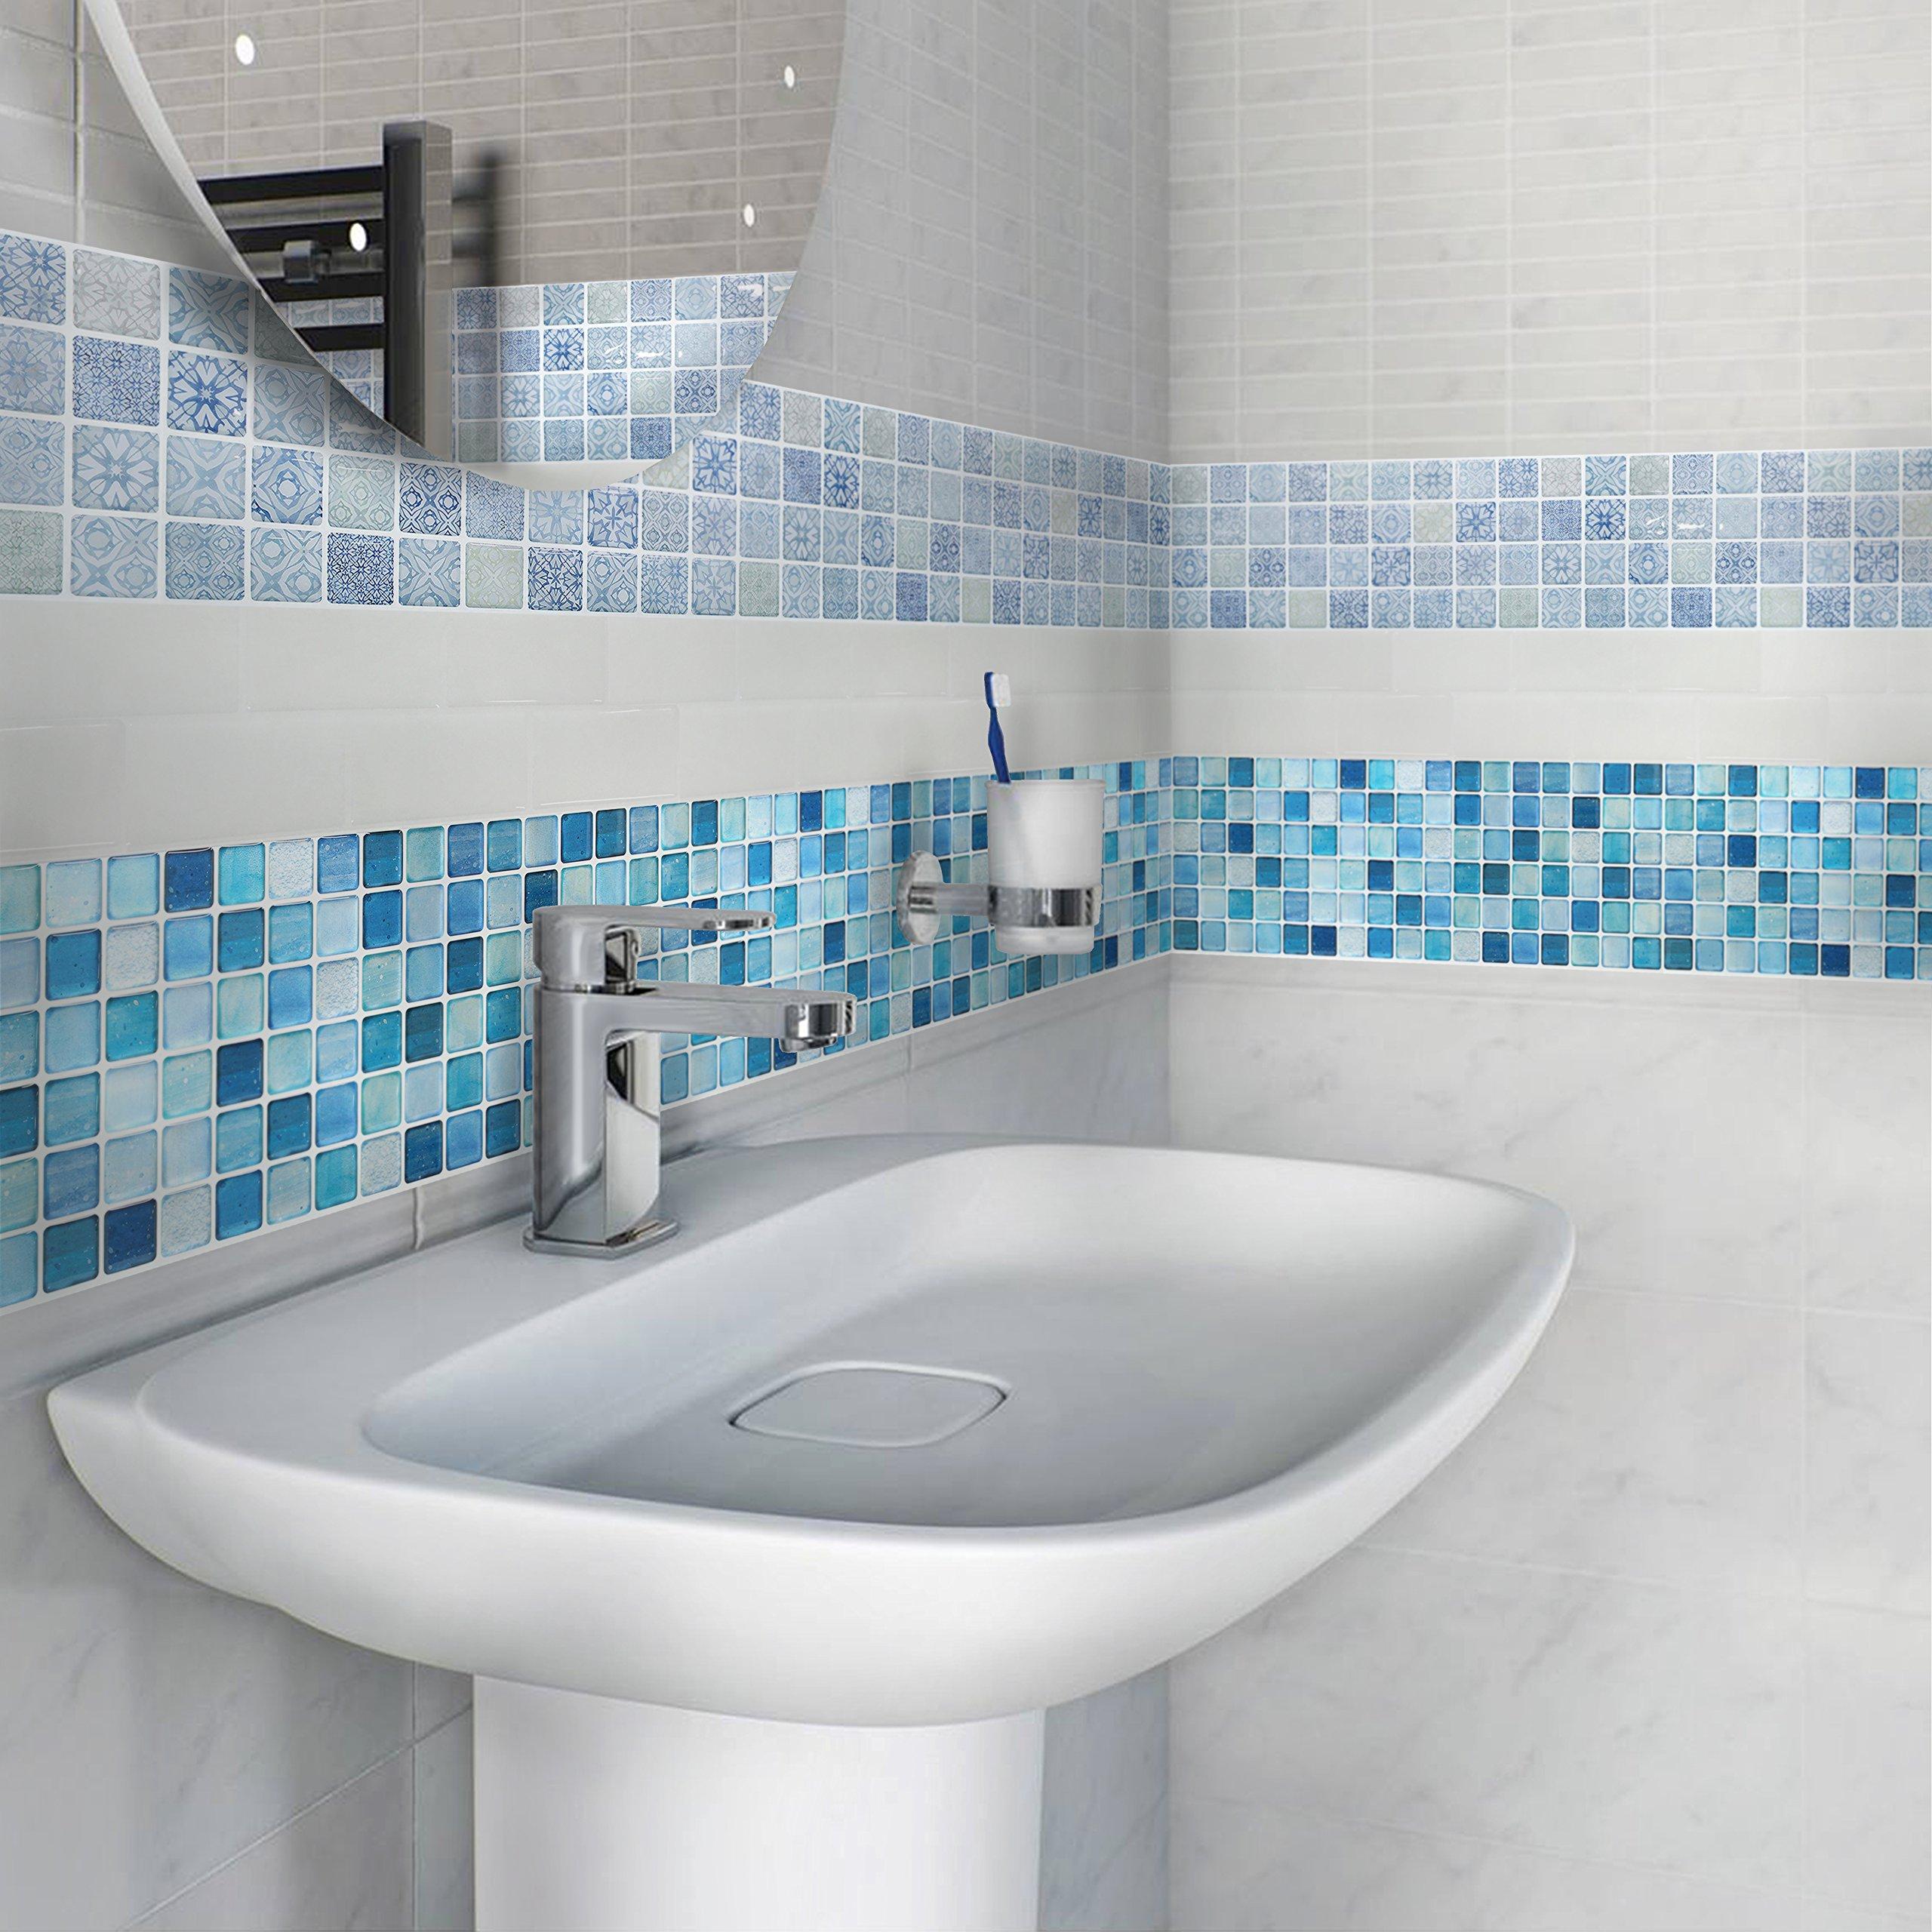 BEAUSTILE Decorative Tile Stickers Peel and Stick Backsplash Fire Retardant Tile Sheet (N.Blue) (10, 5.28'' x 14.8'') by BEAUS TILE (Image #4)